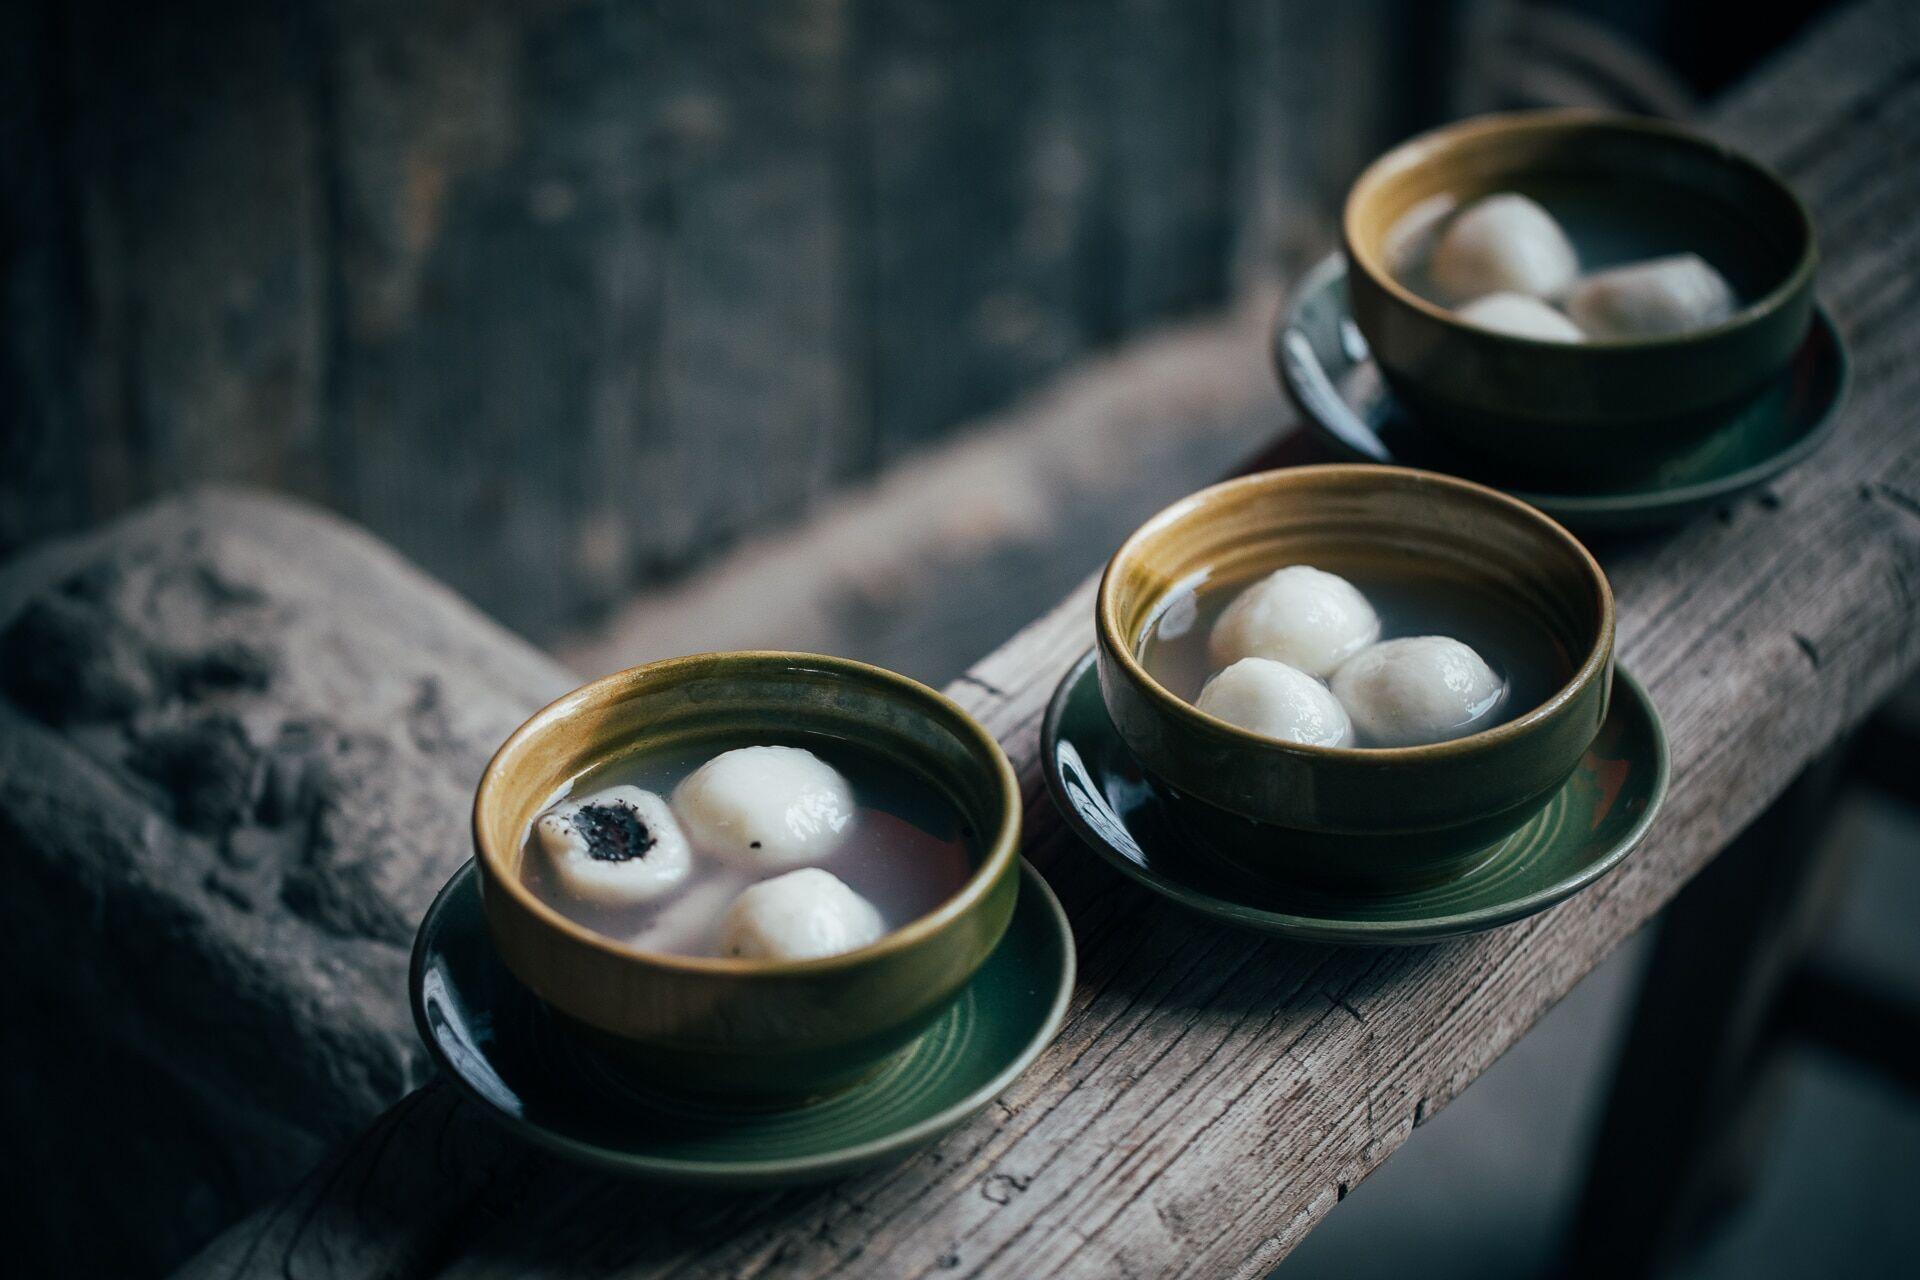 Рисовые шарики танъюань